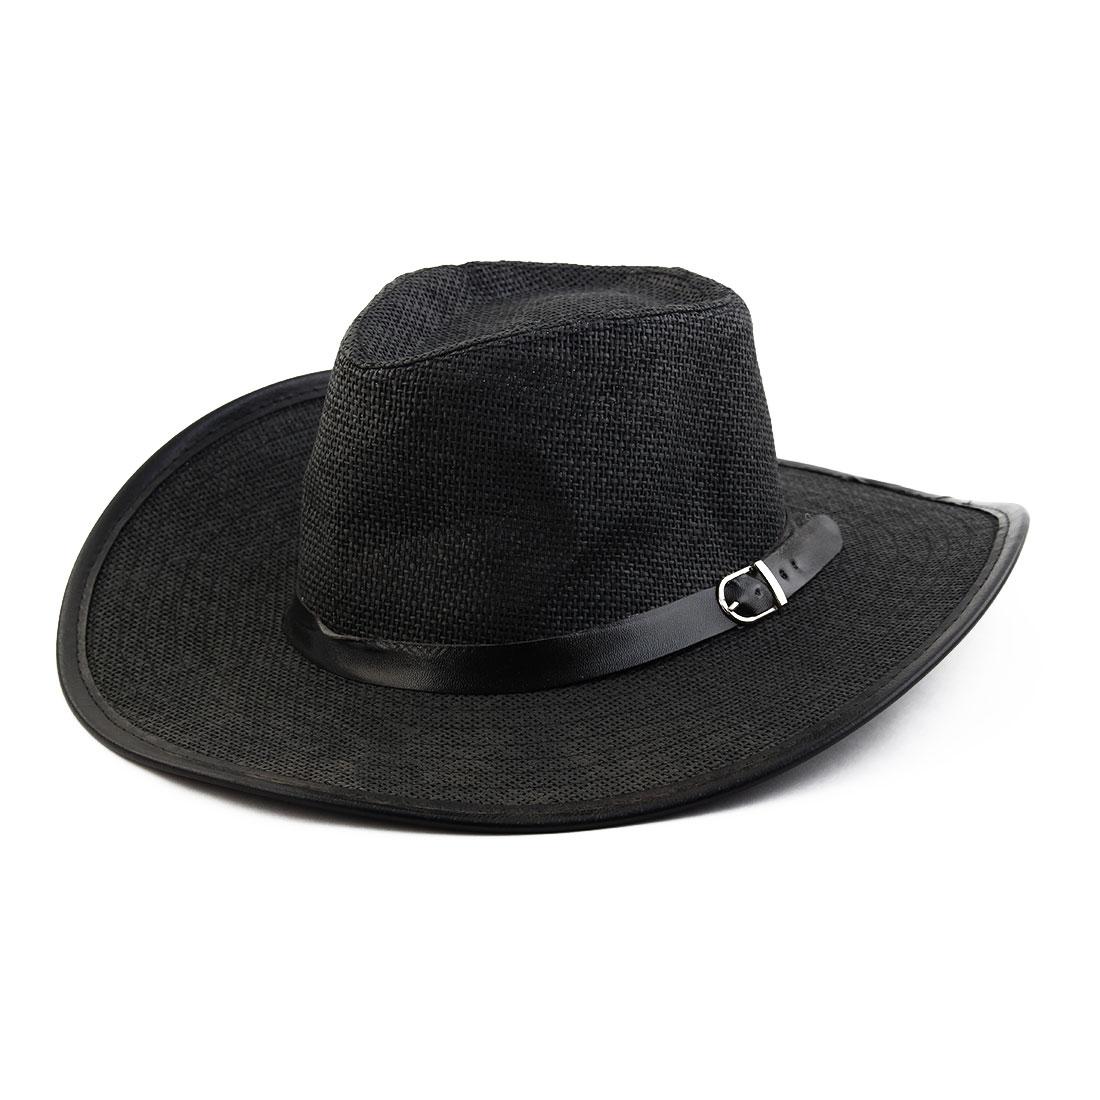 Summer Straw Braided Faux Leather Band Decor Western Sunhat Cowboy Hat Black